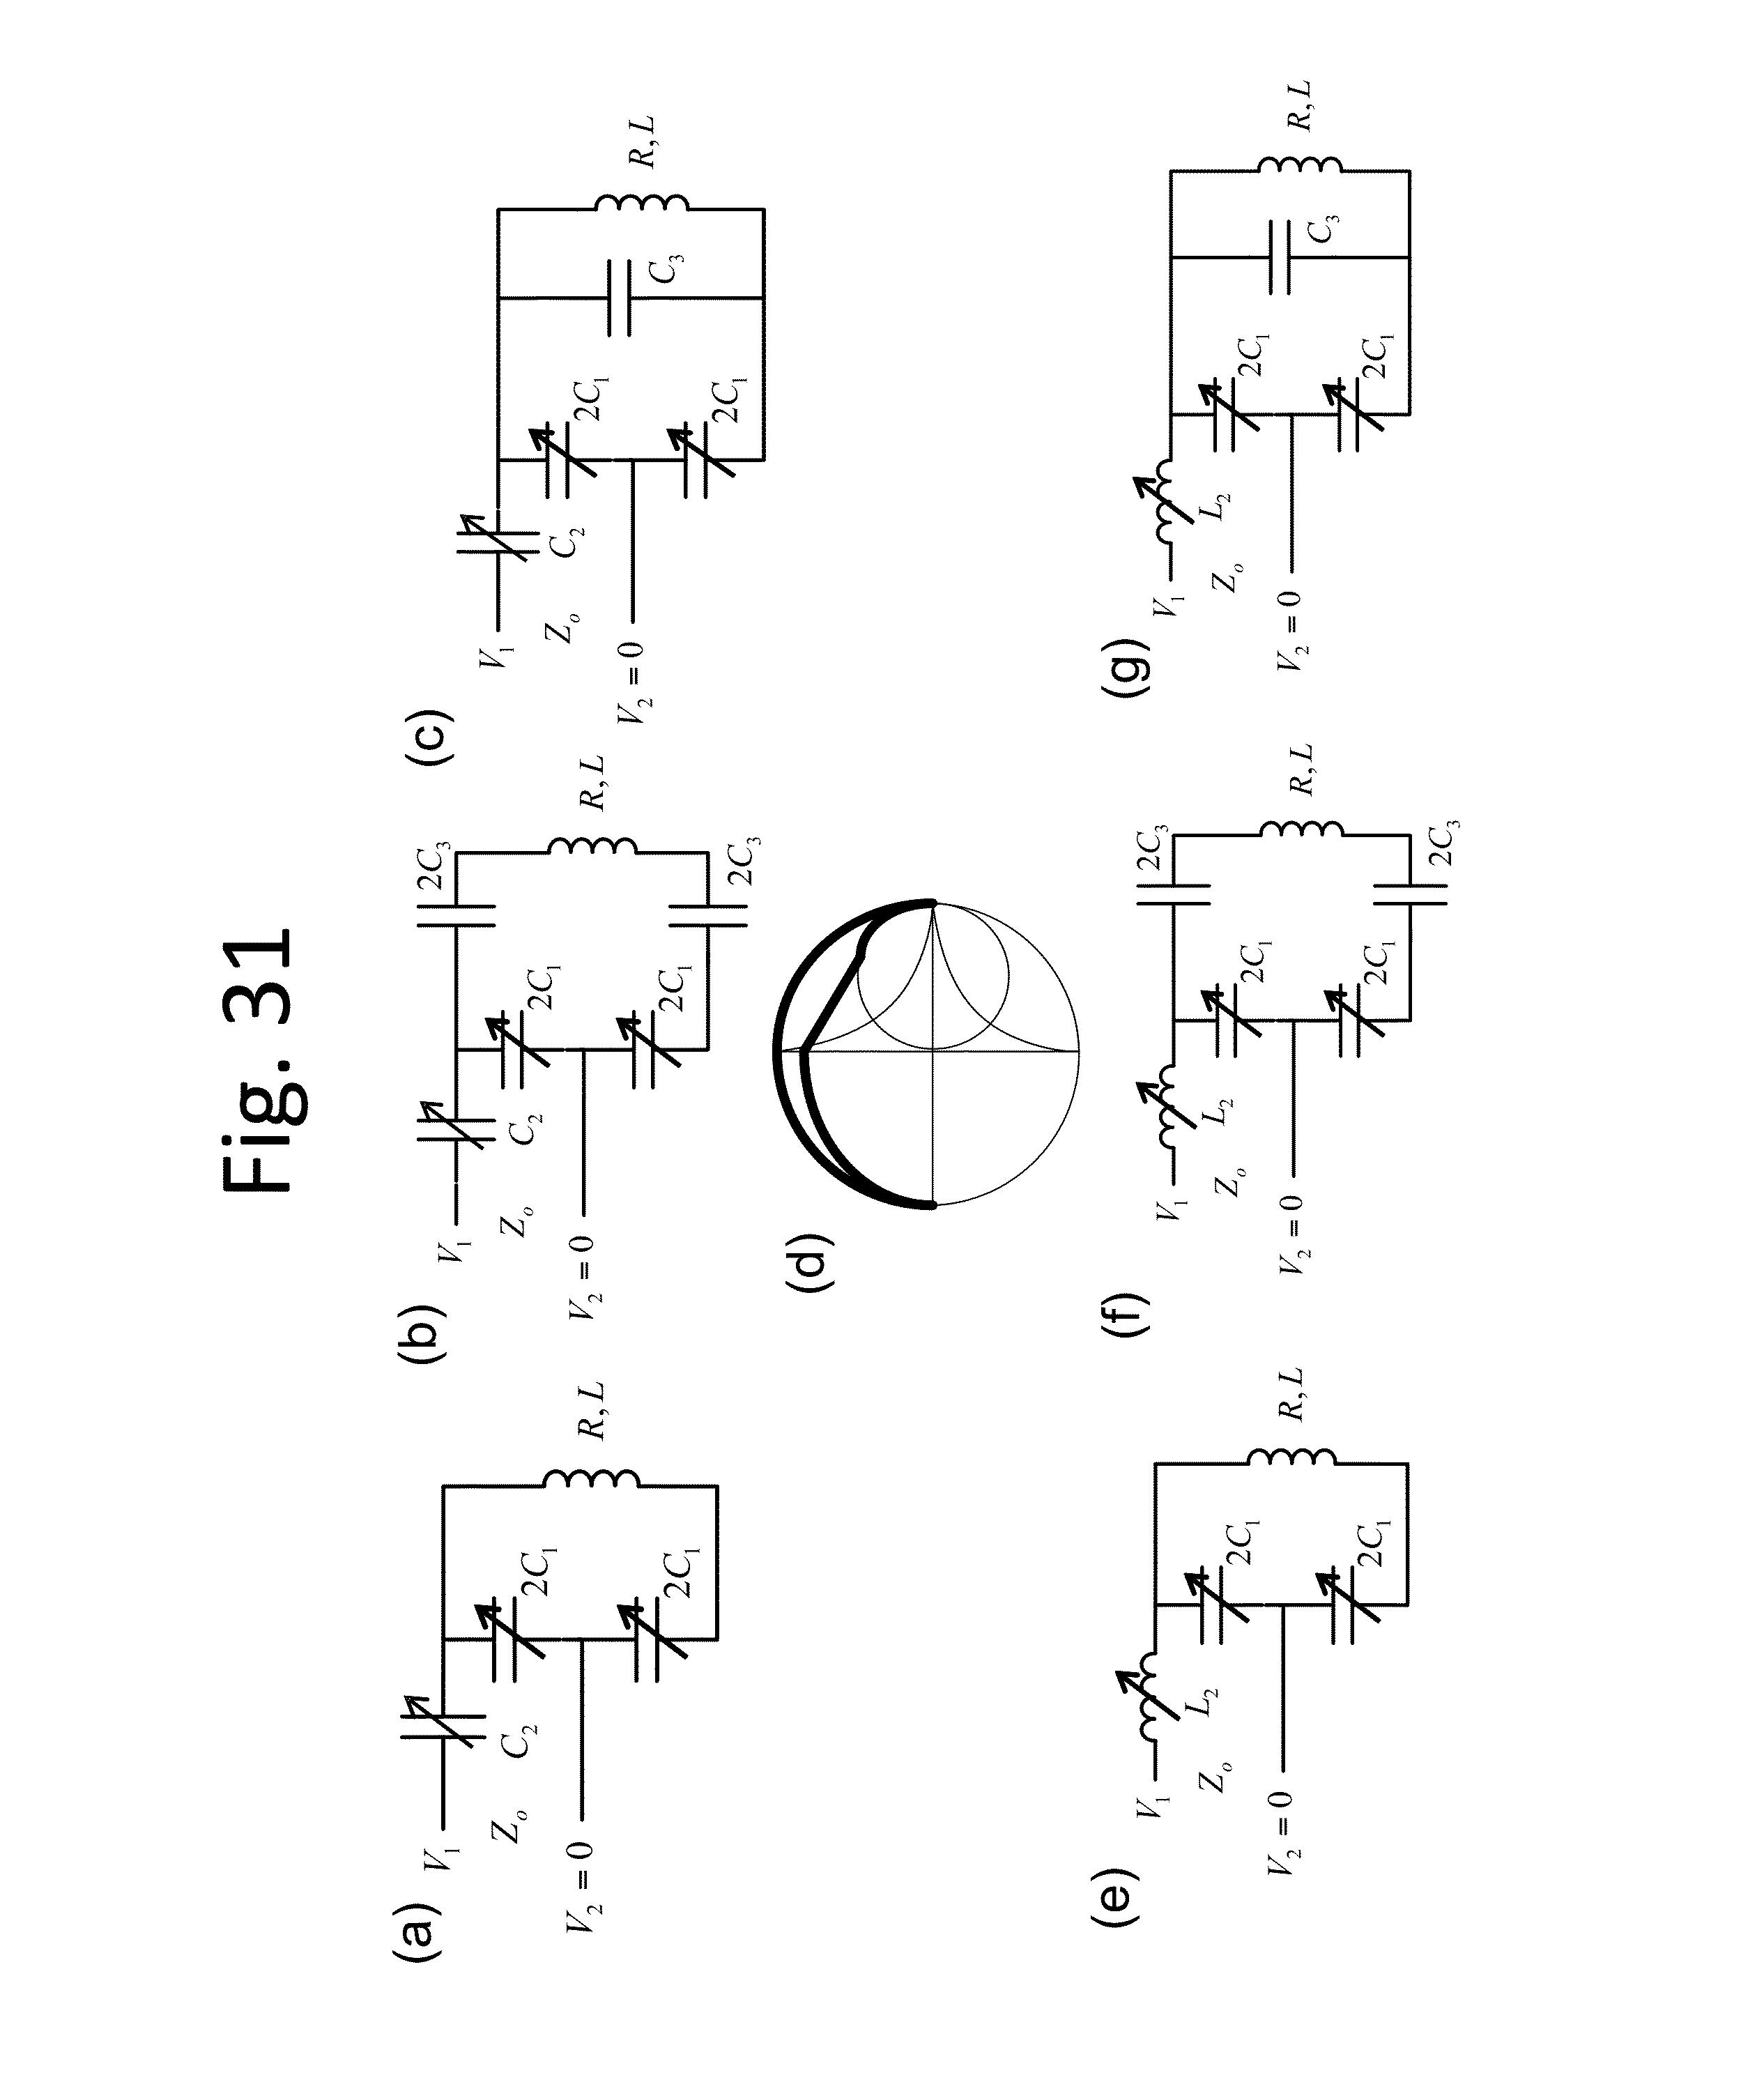 Patent Us 8487480 B1 Radiosparkscomschematics Indexoscillators11 2 2016 Images